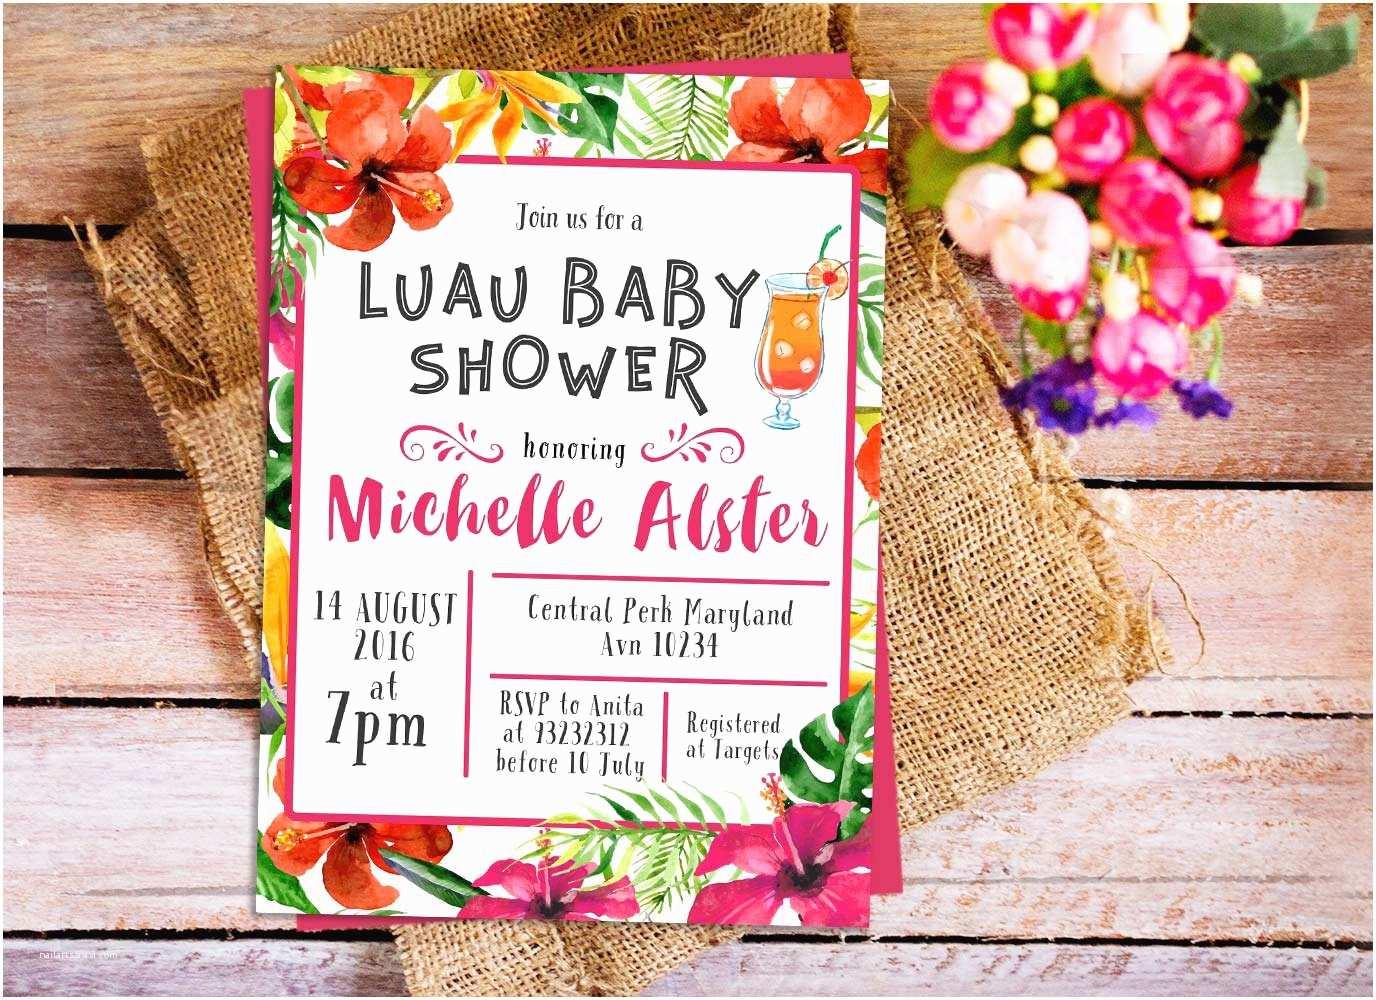 Luau Baby Shower Invitations Hawaiian Luau Baby Shower Invitation Hawaiian Tropical